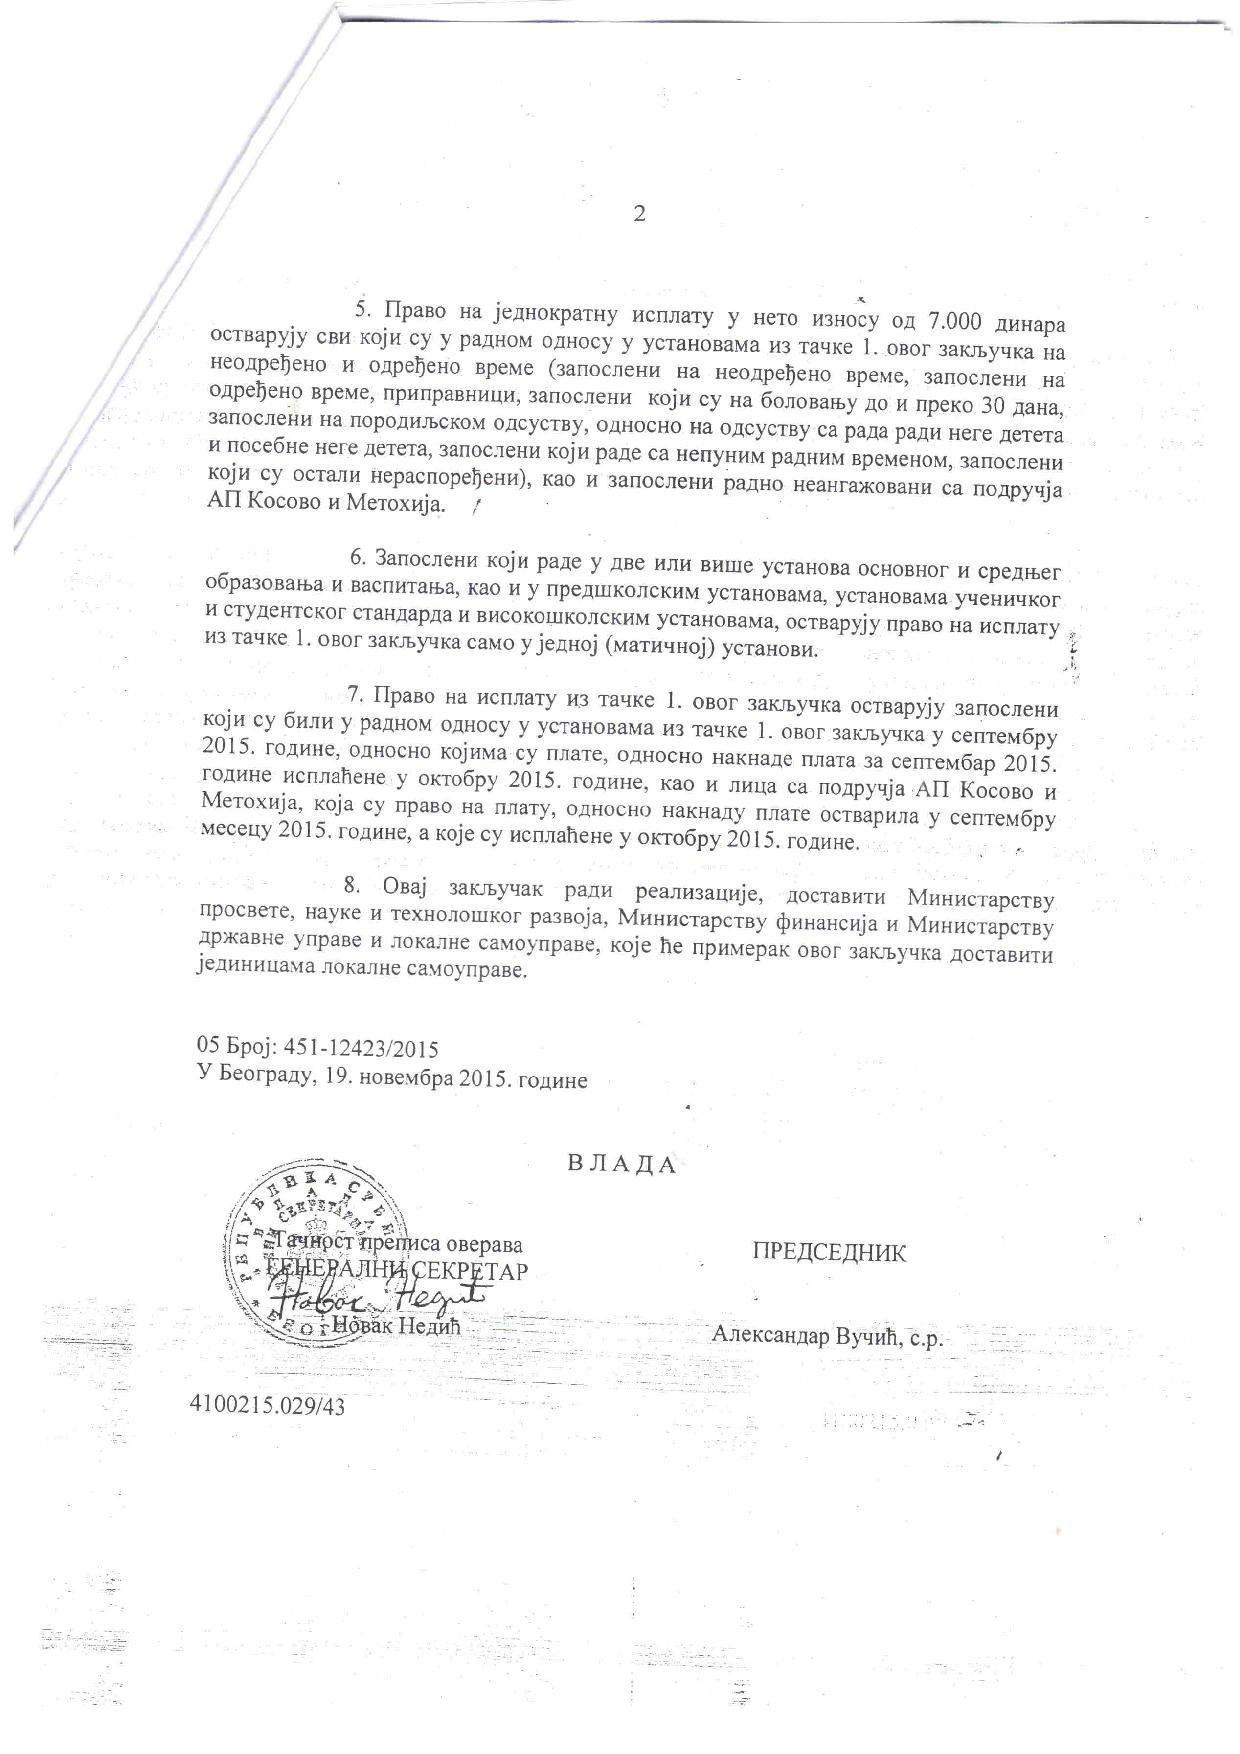 3. Dopis Ministra prosvete u vezi sa PU 22.12.2015-page-003